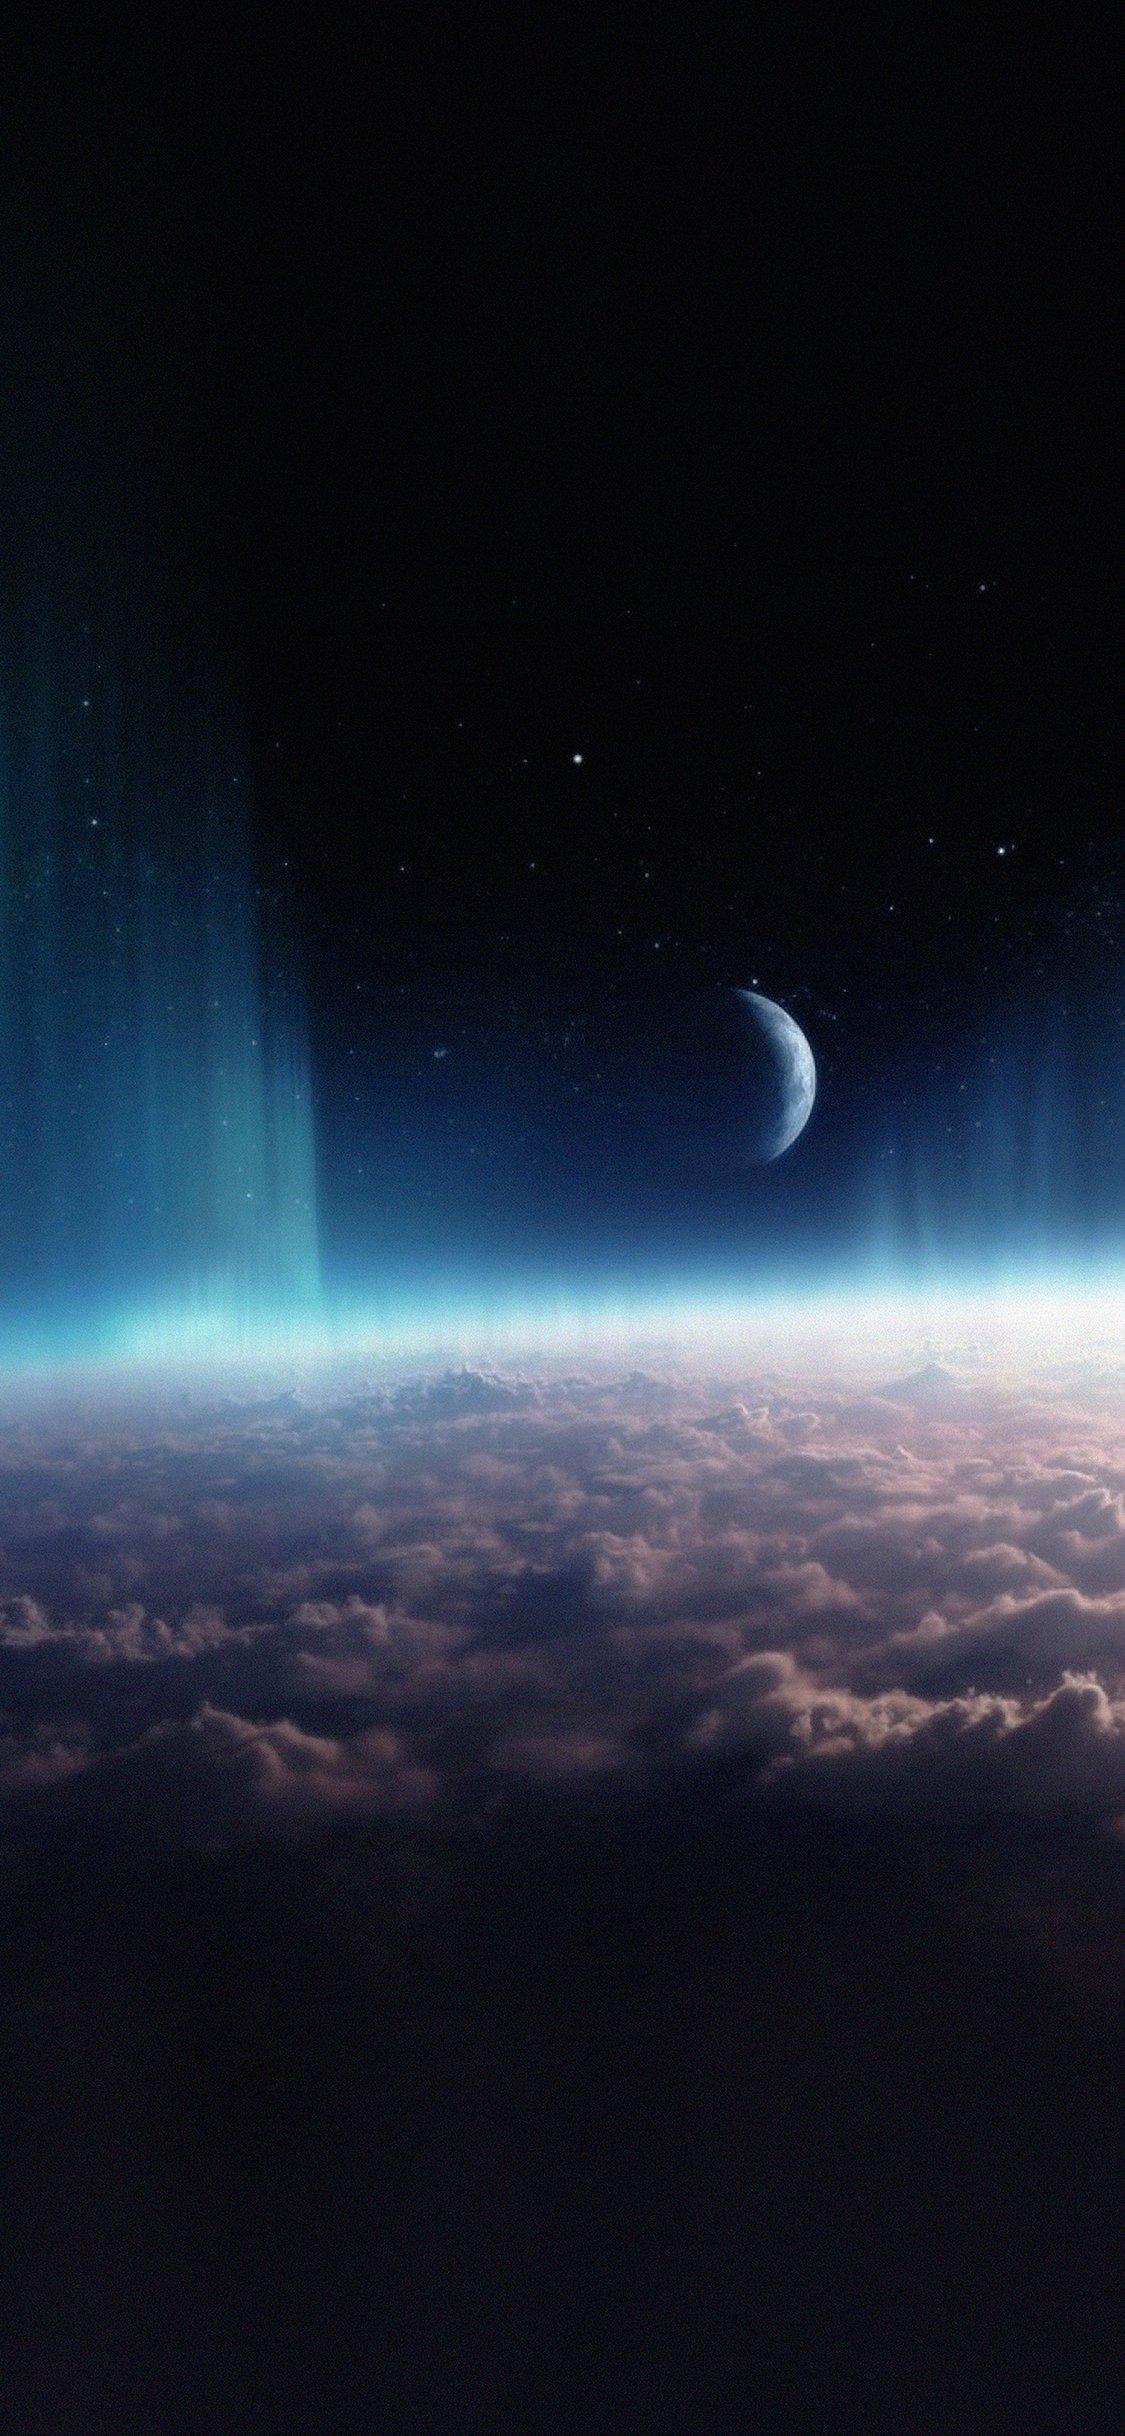 Space interstellar iPhone X wallpaper